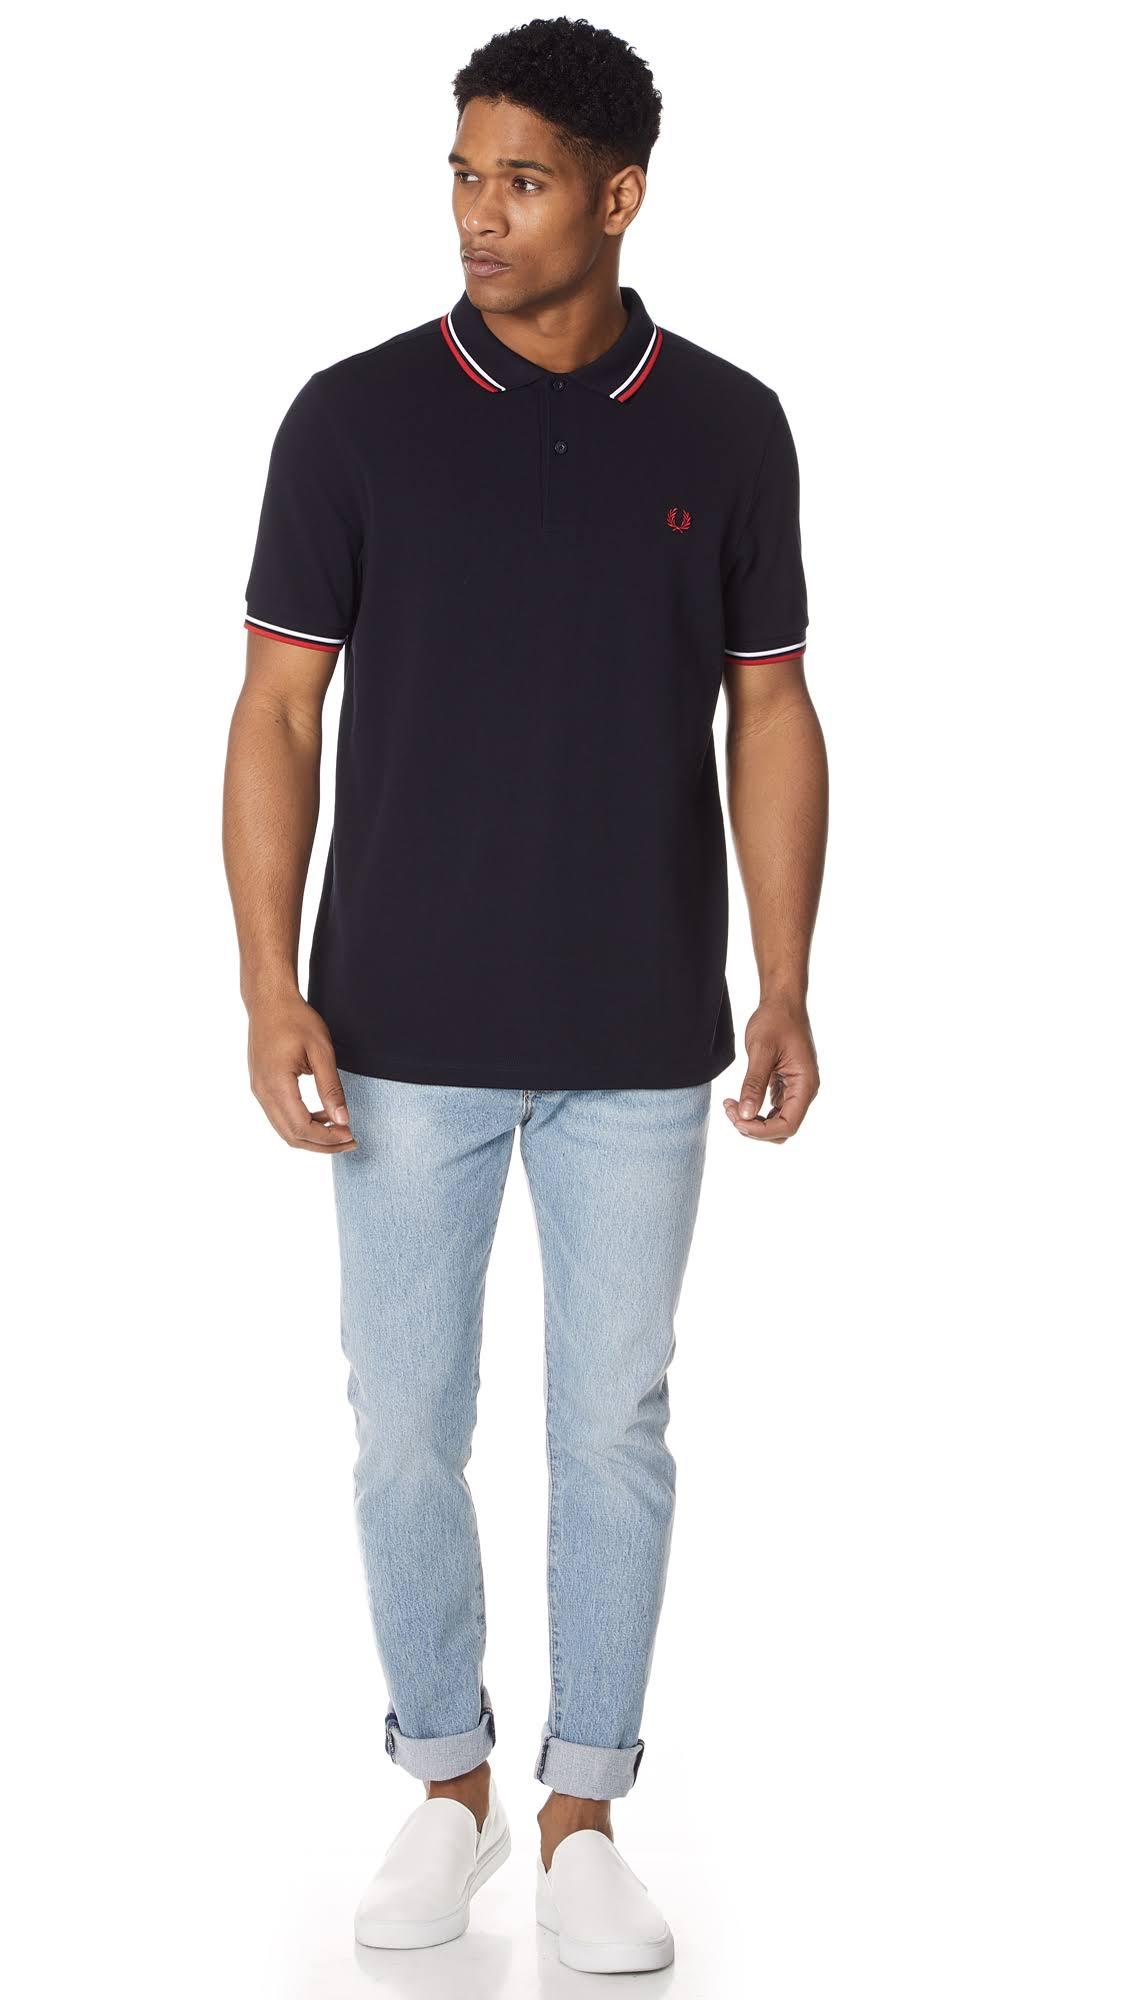 Gekippten Zwei Poloshirt Fred Spitzen N Mit Perry W M3600 R Mod W14WwRYXq